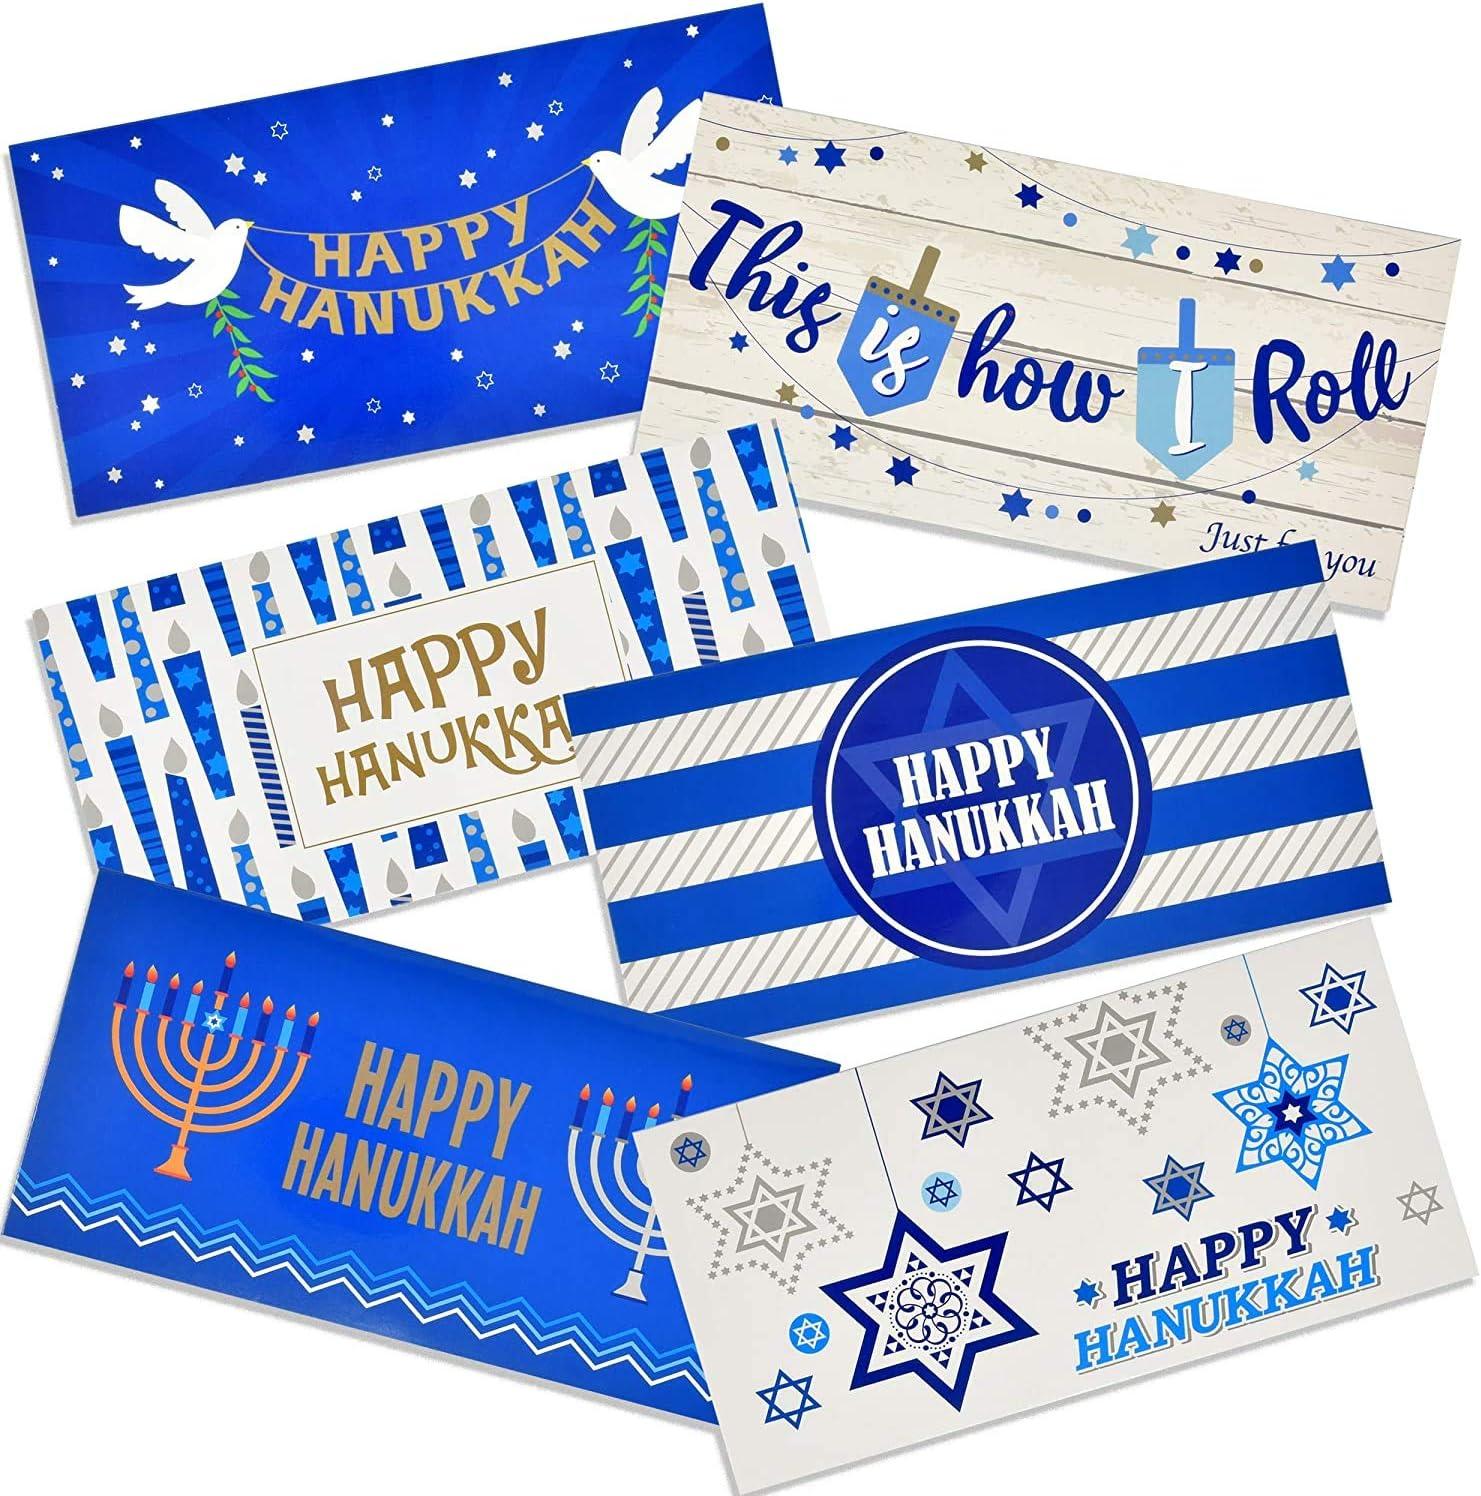 6 Pack Happy Hanukkah Chanukah Card Money /& GiftCard Holders w// Envelopes